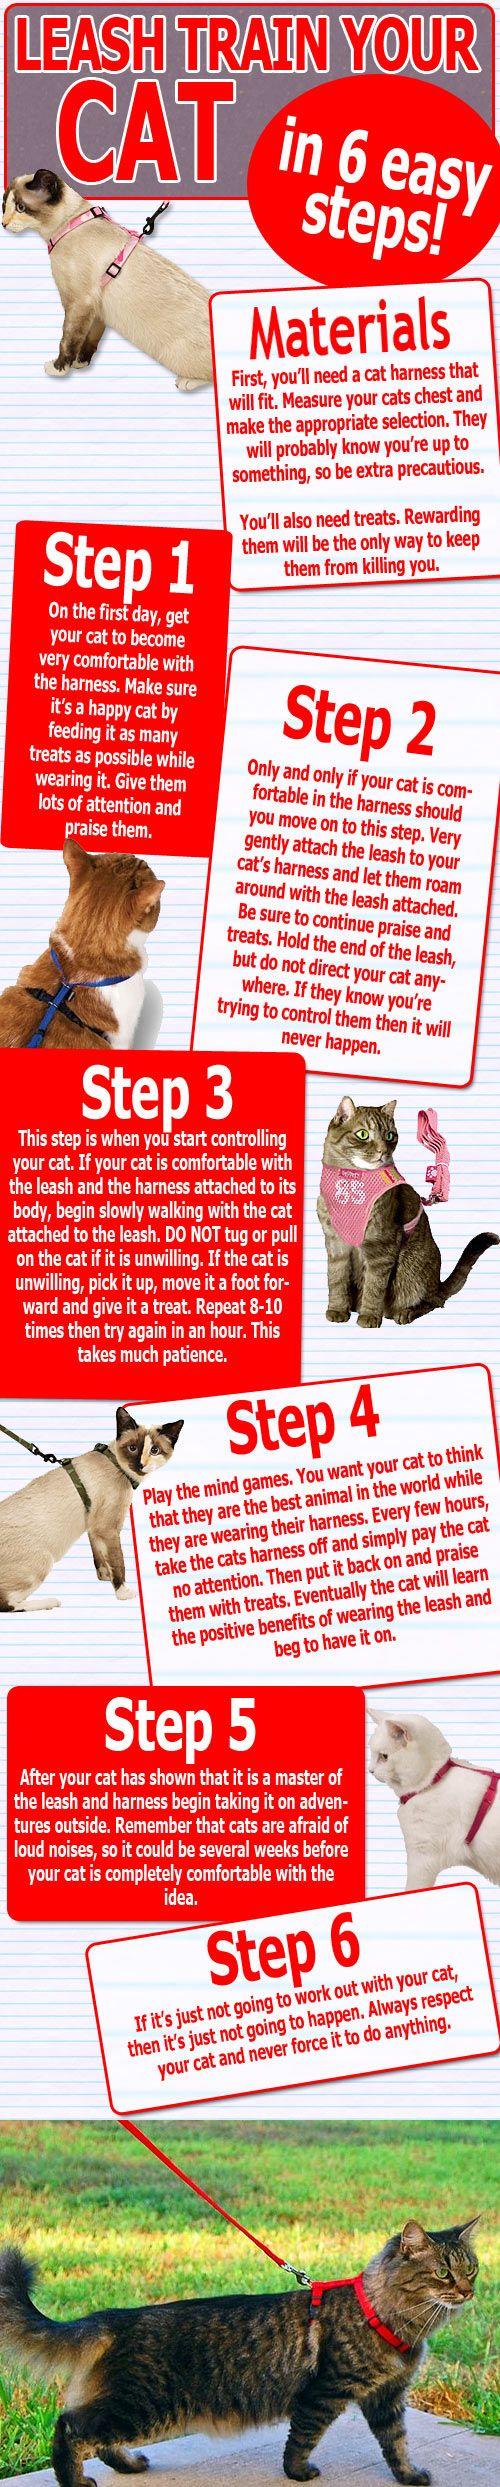 Leash Train A Cat 6 Easy Steps Cat Leash Crazy Cats Cats